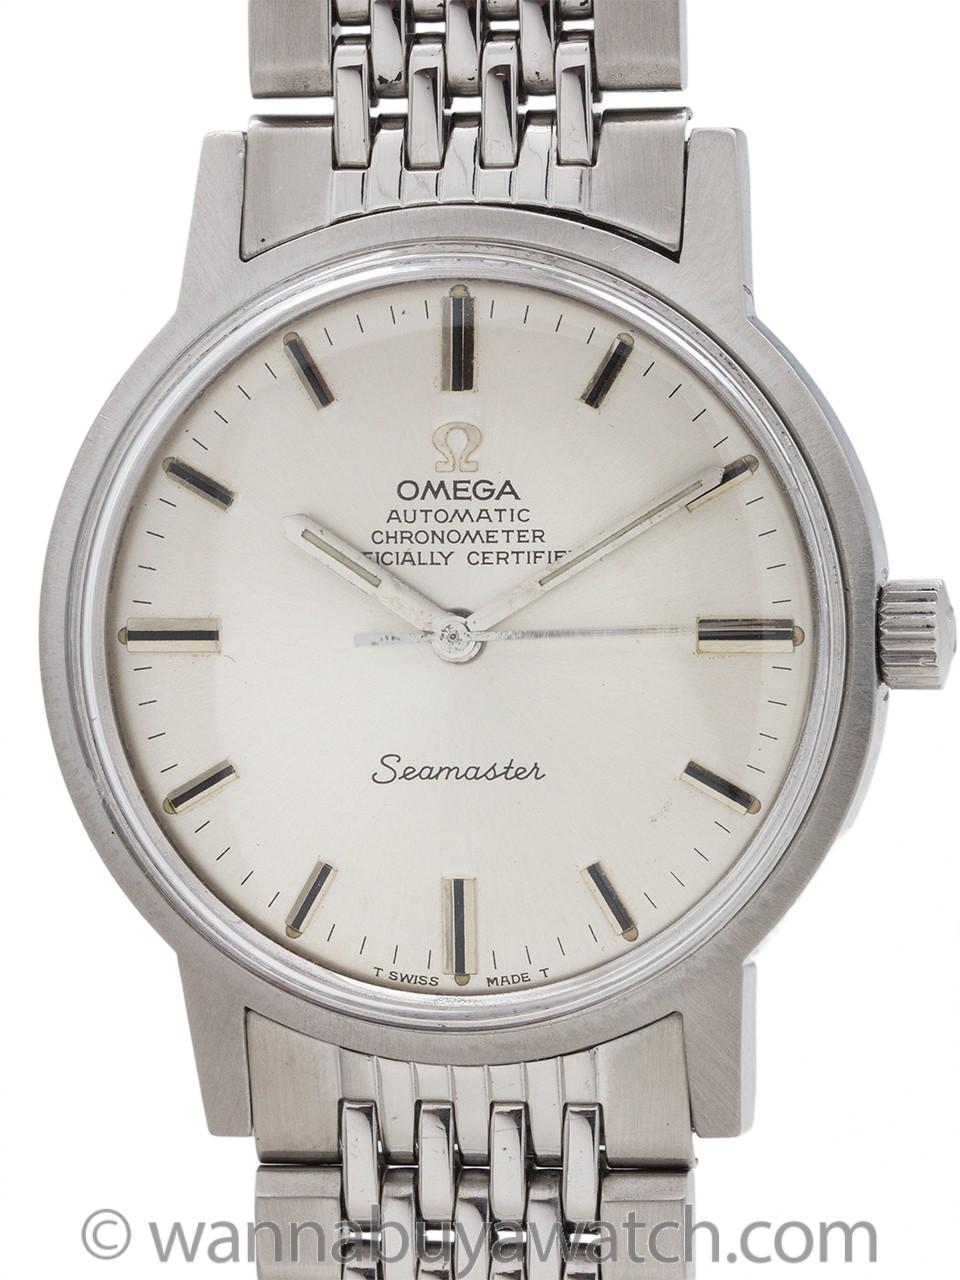 Omega Chronometer Certified Seamaster ref 165.010 circa 1968